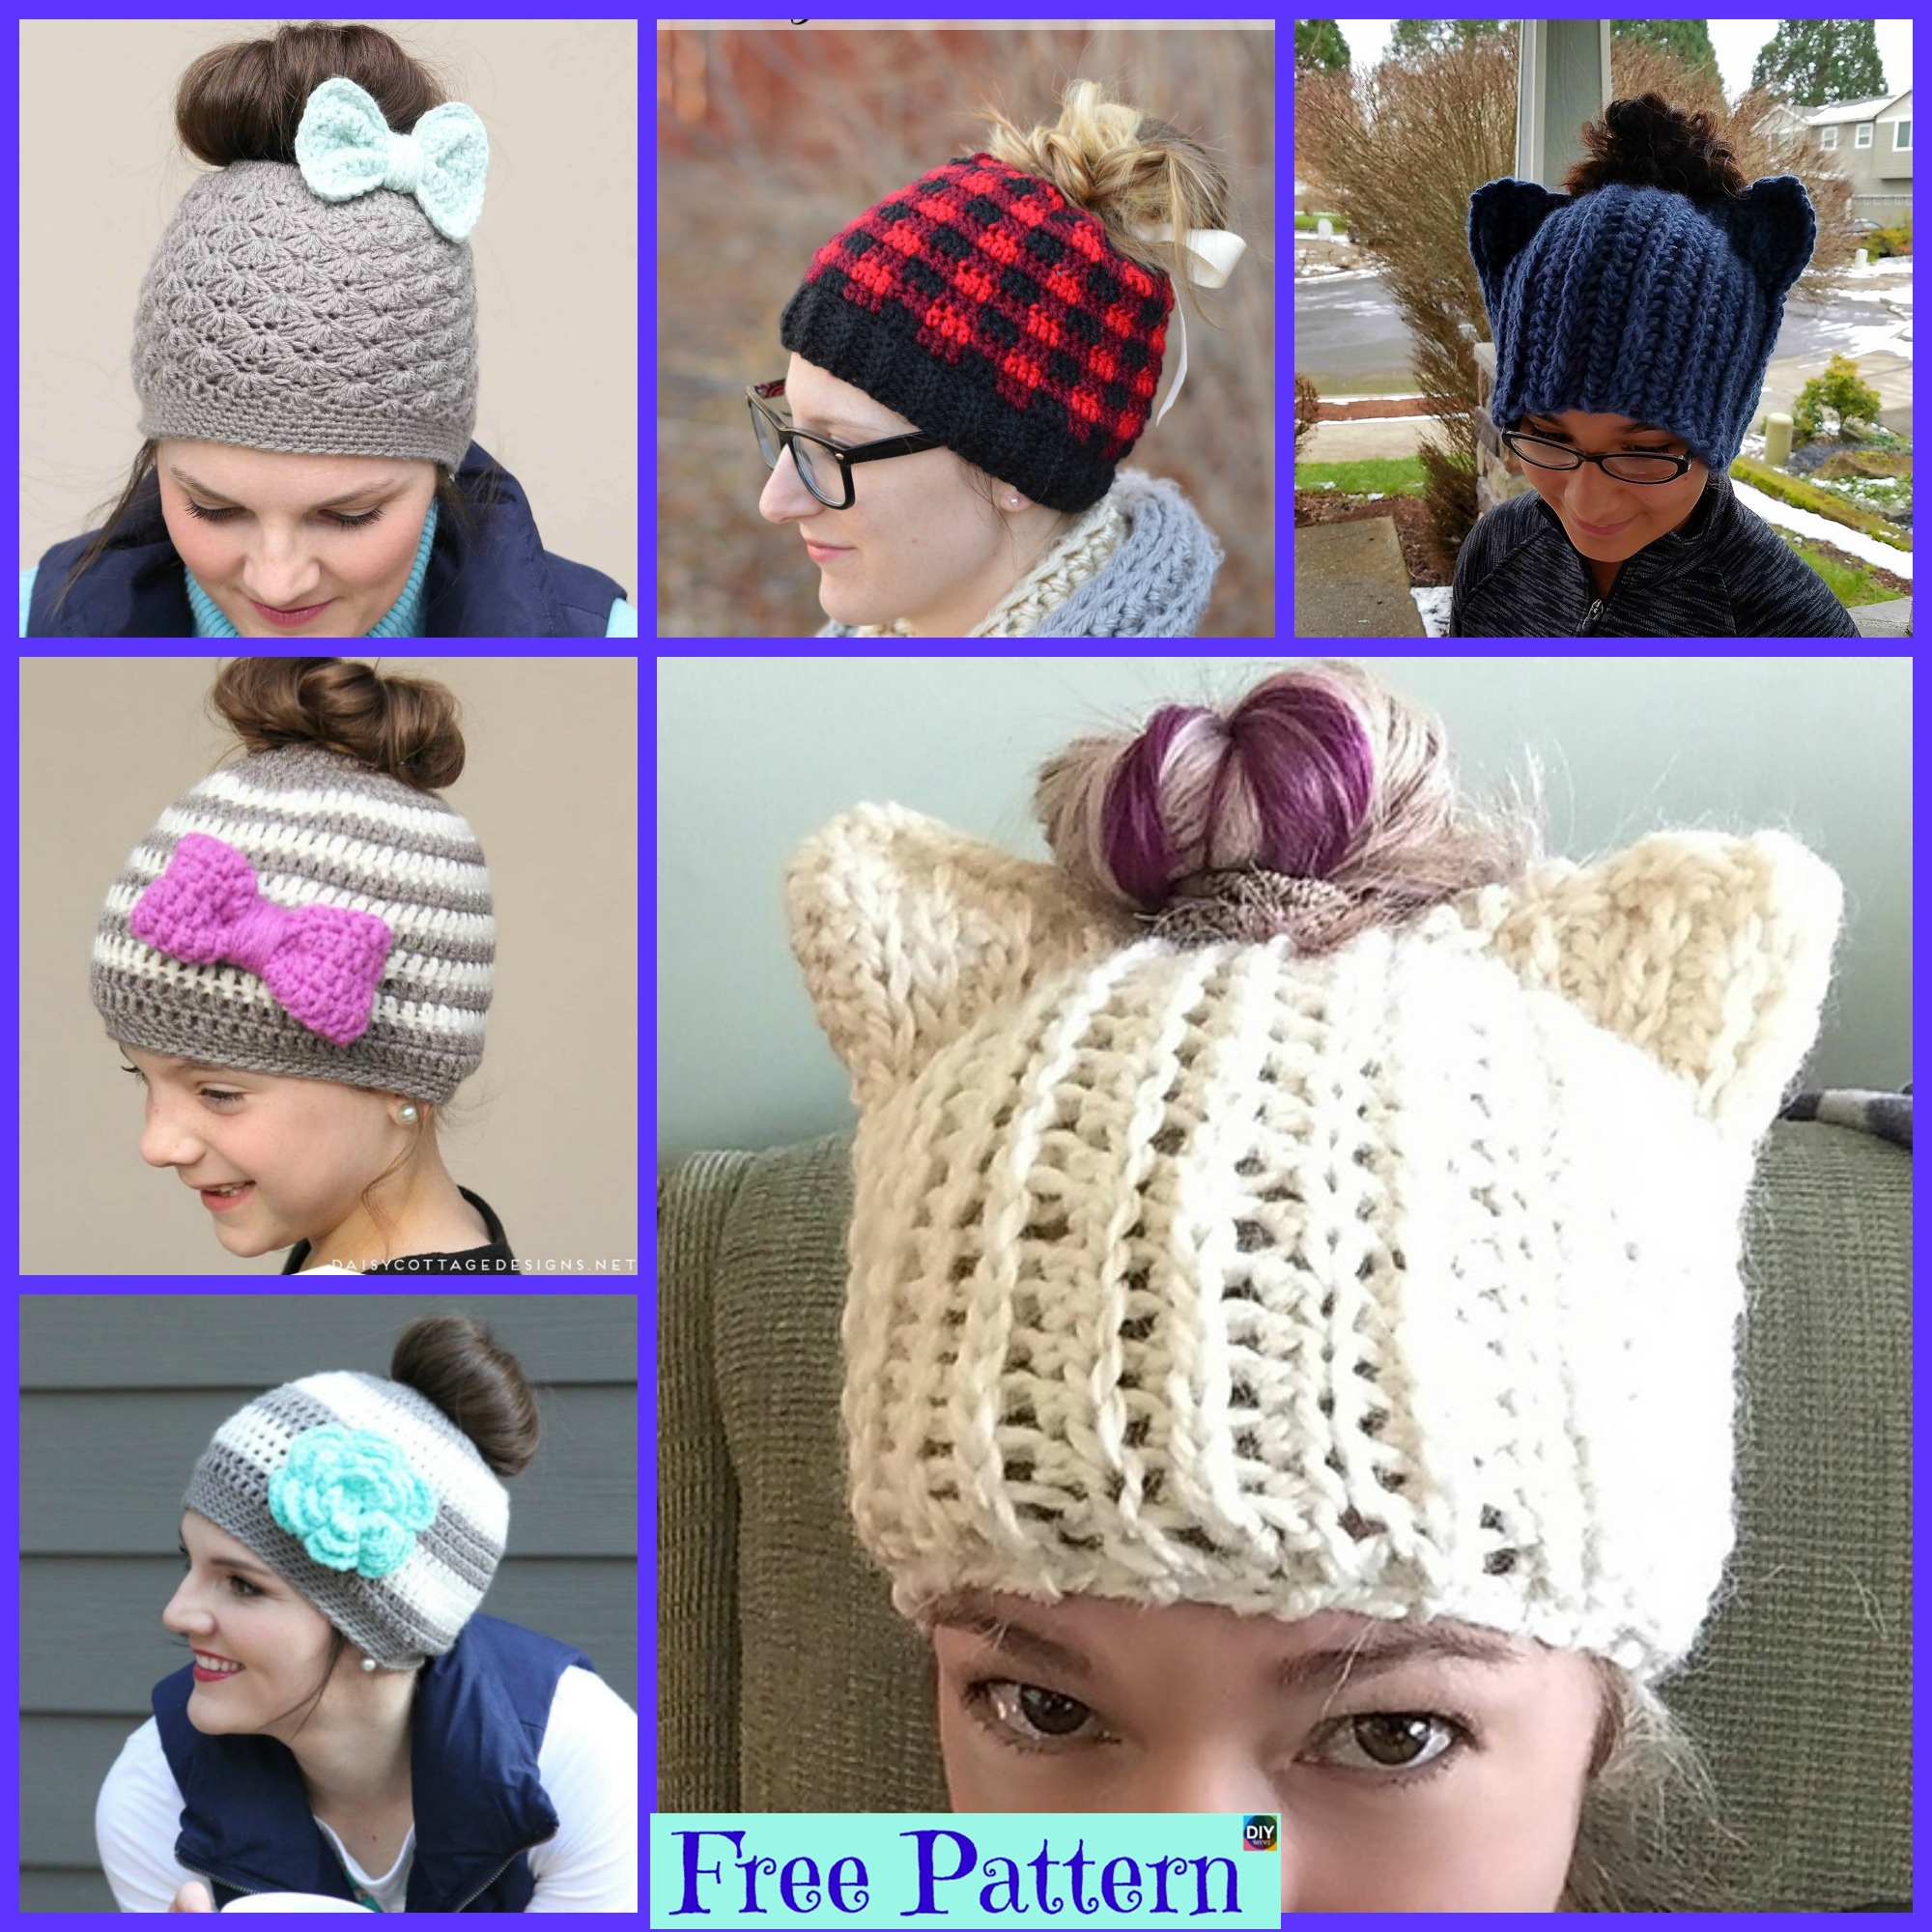 diy4ever-8 Crochet Messy Bun Hat Free Patterns